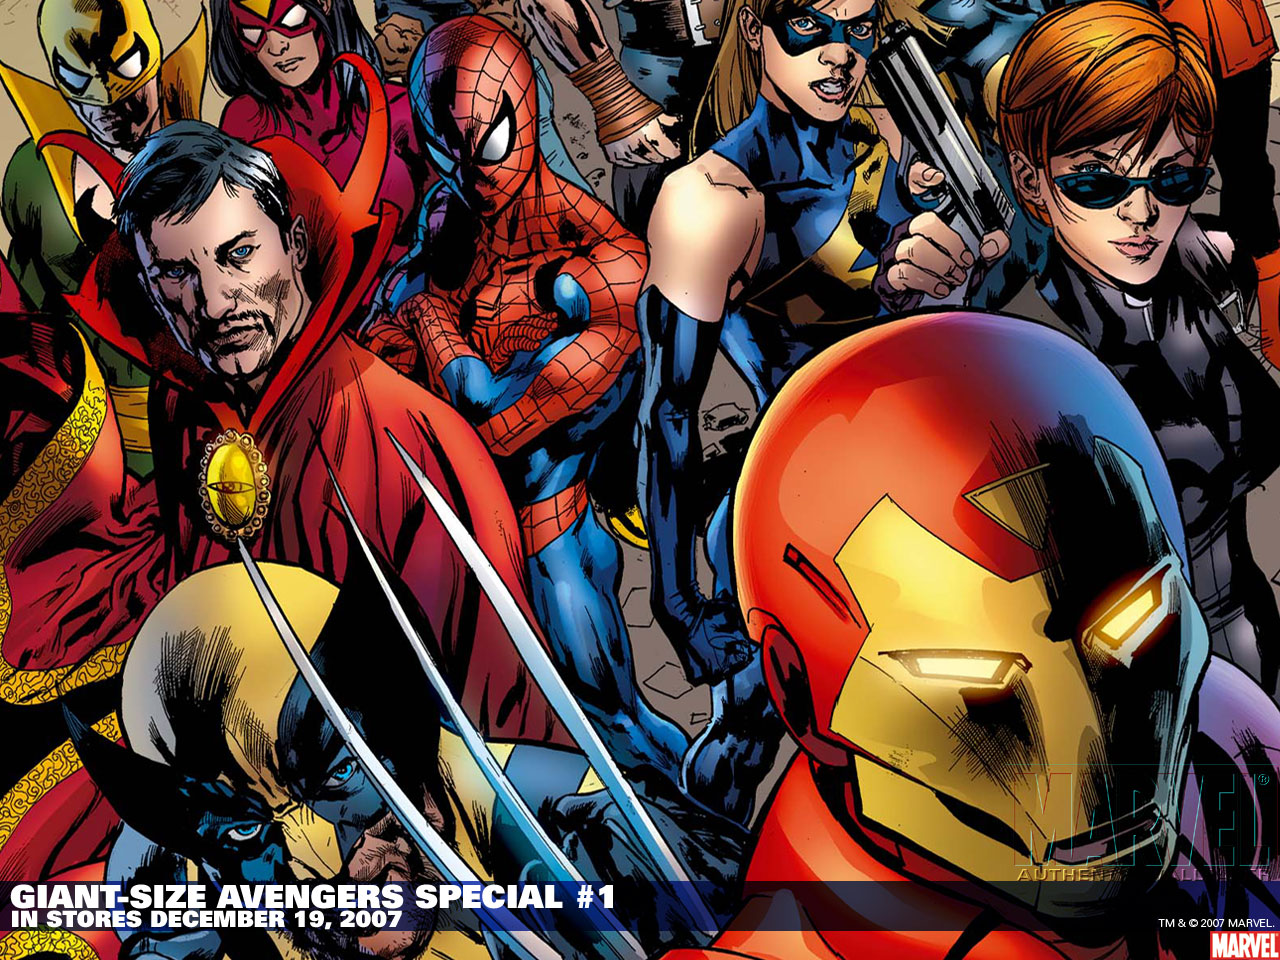 Superheroes marvel wallpaper 3